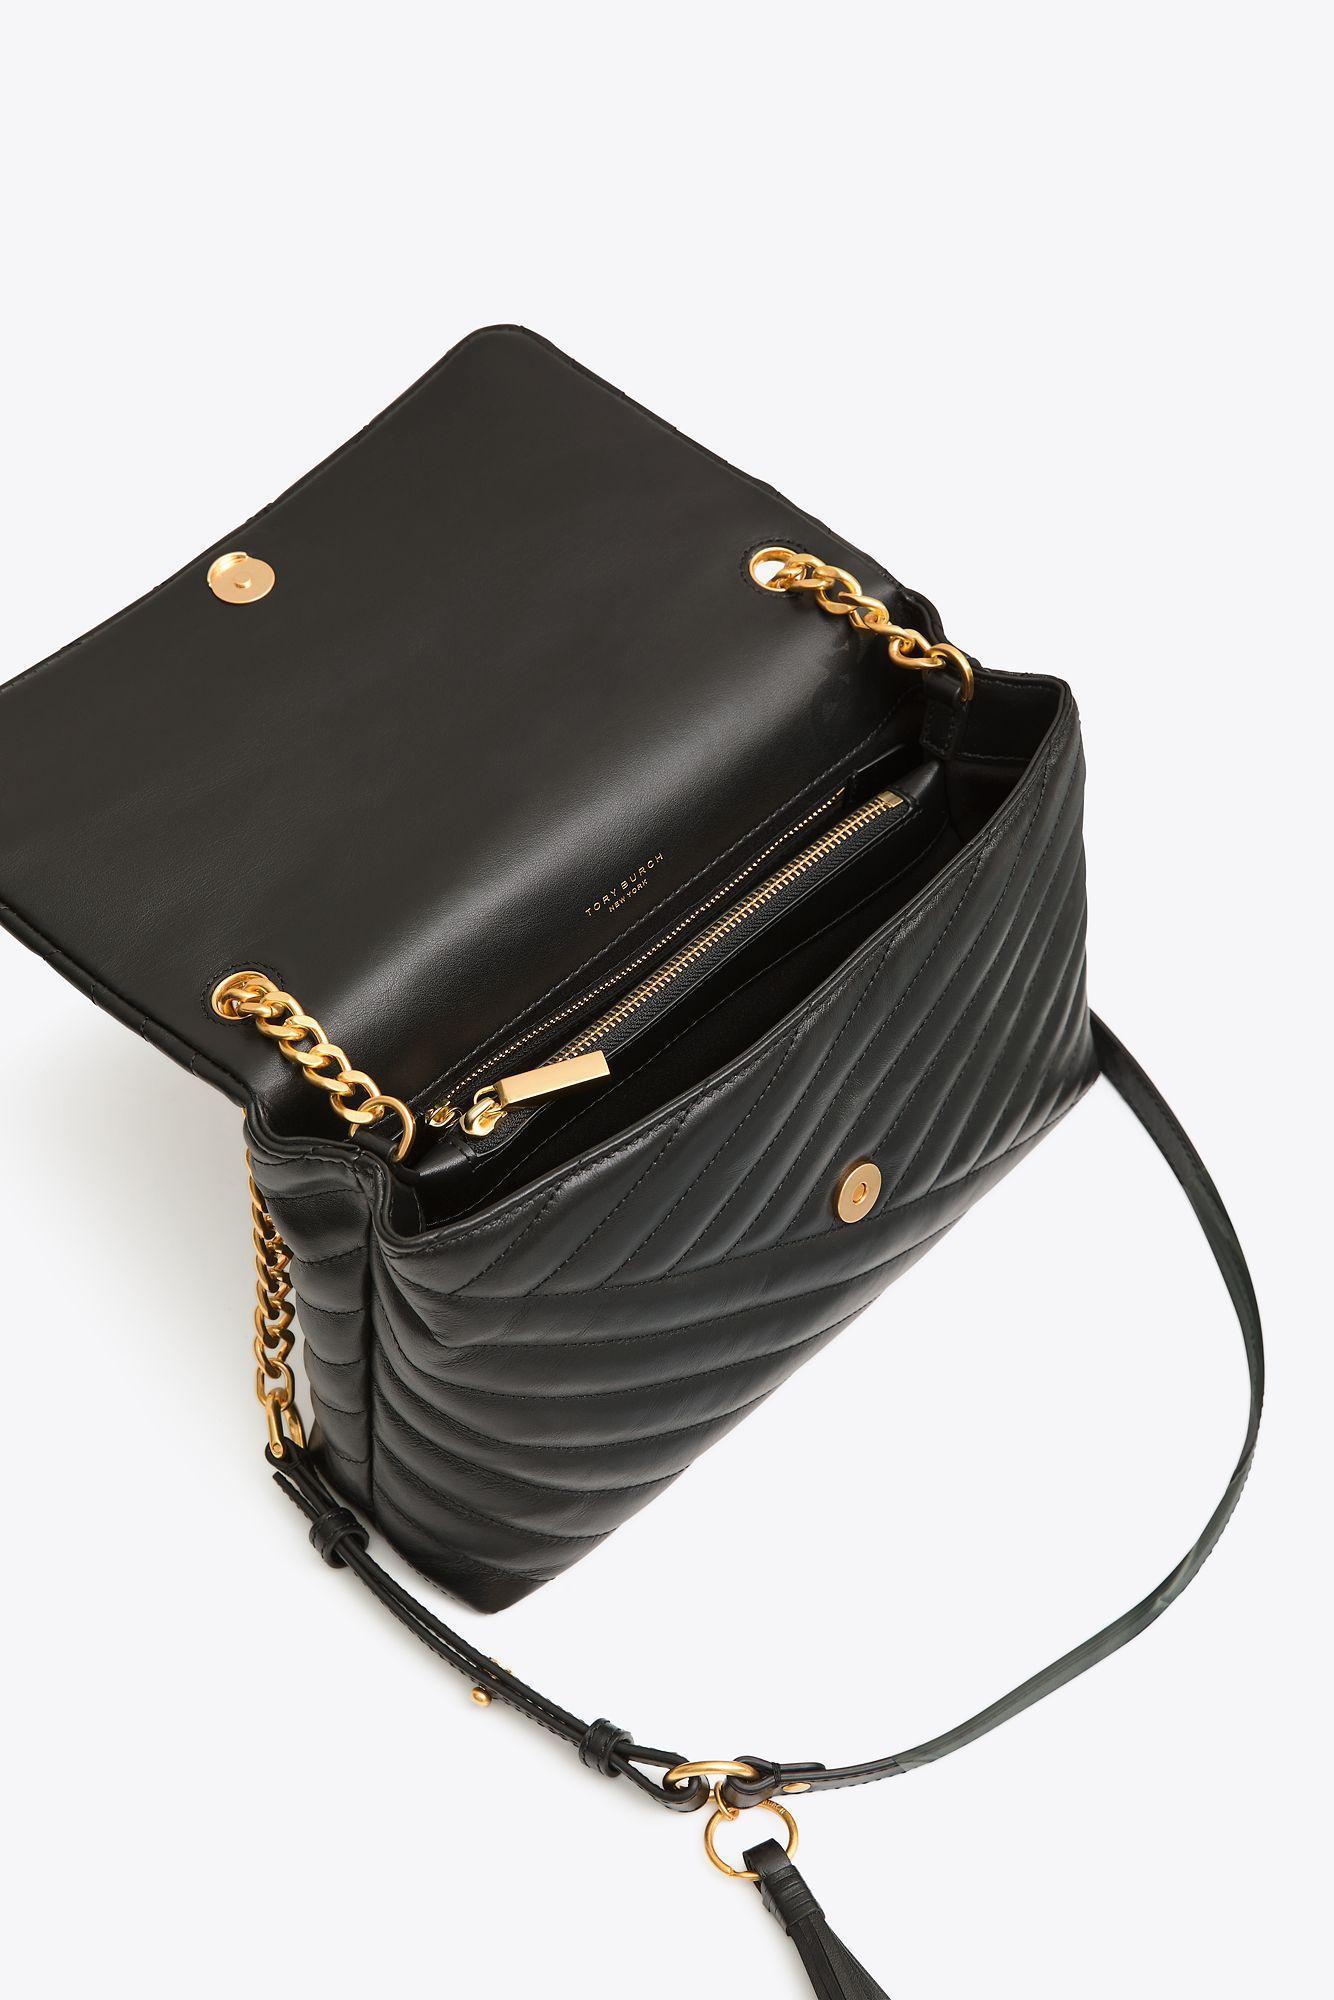 6b4ee62c7e80 Tory Burch Kira Chevron Flap Shoulder Bag in Black - Save 18% - Lyst